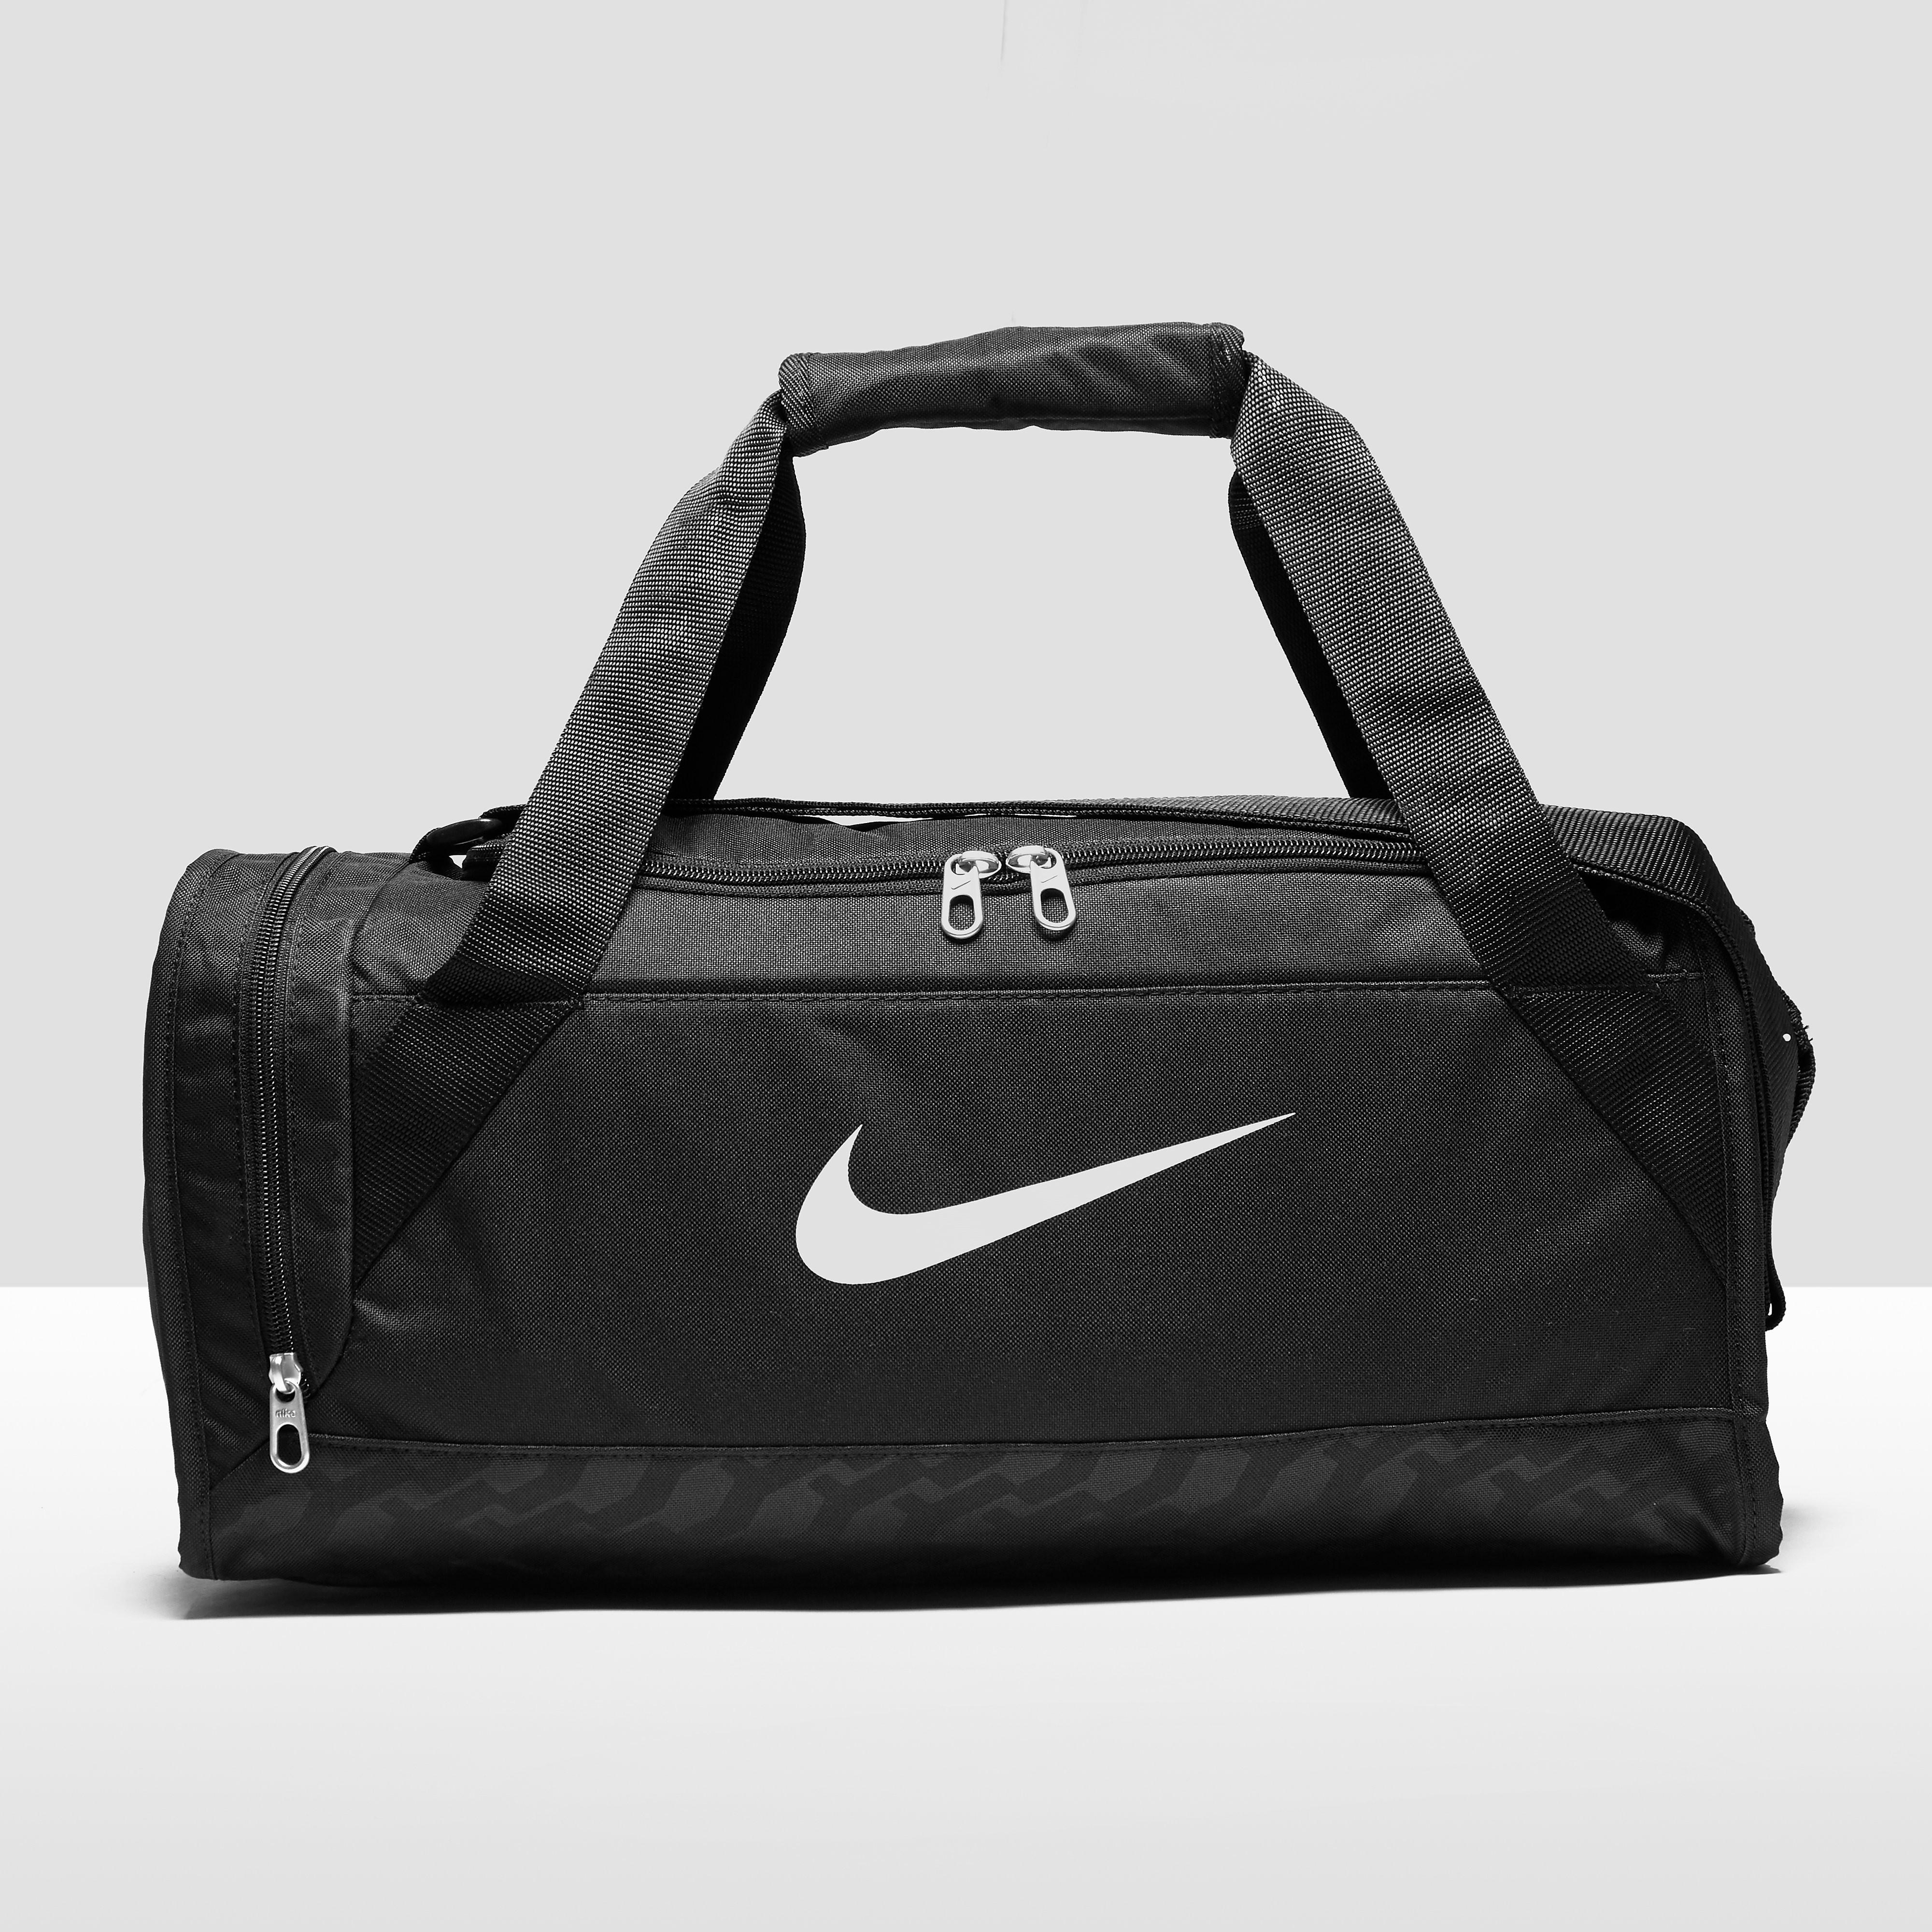 Nike BRASILIA 6 XS